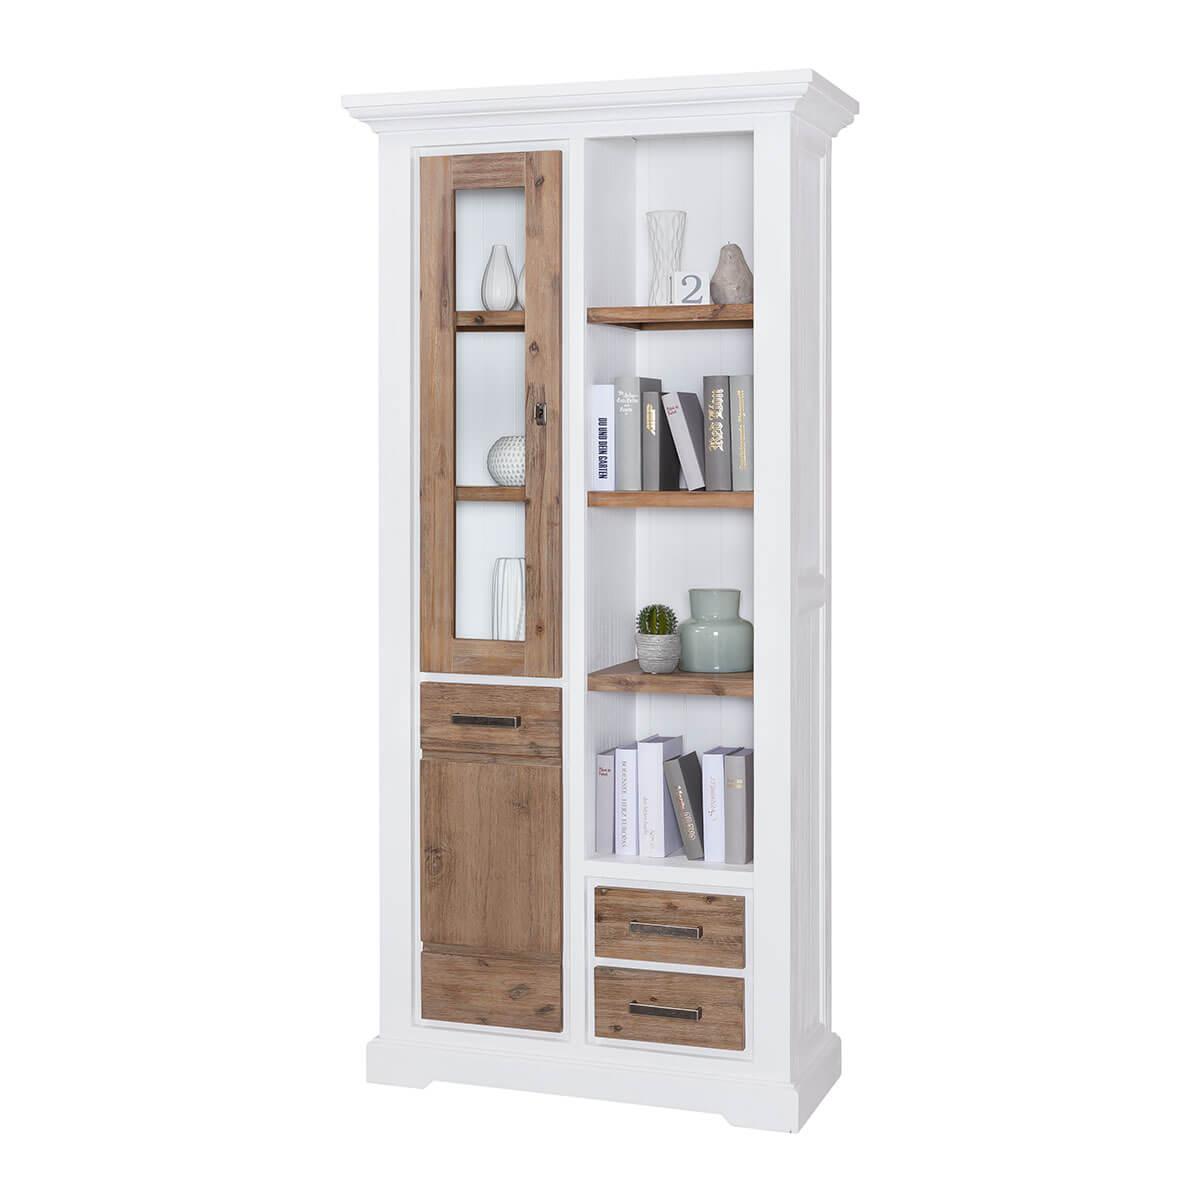 vitrine akazie massivholz kommode wei braun massiv massivm bel schrank 200 cm ebay. Black Bedroom Furniture Sets. Home Design Ideas